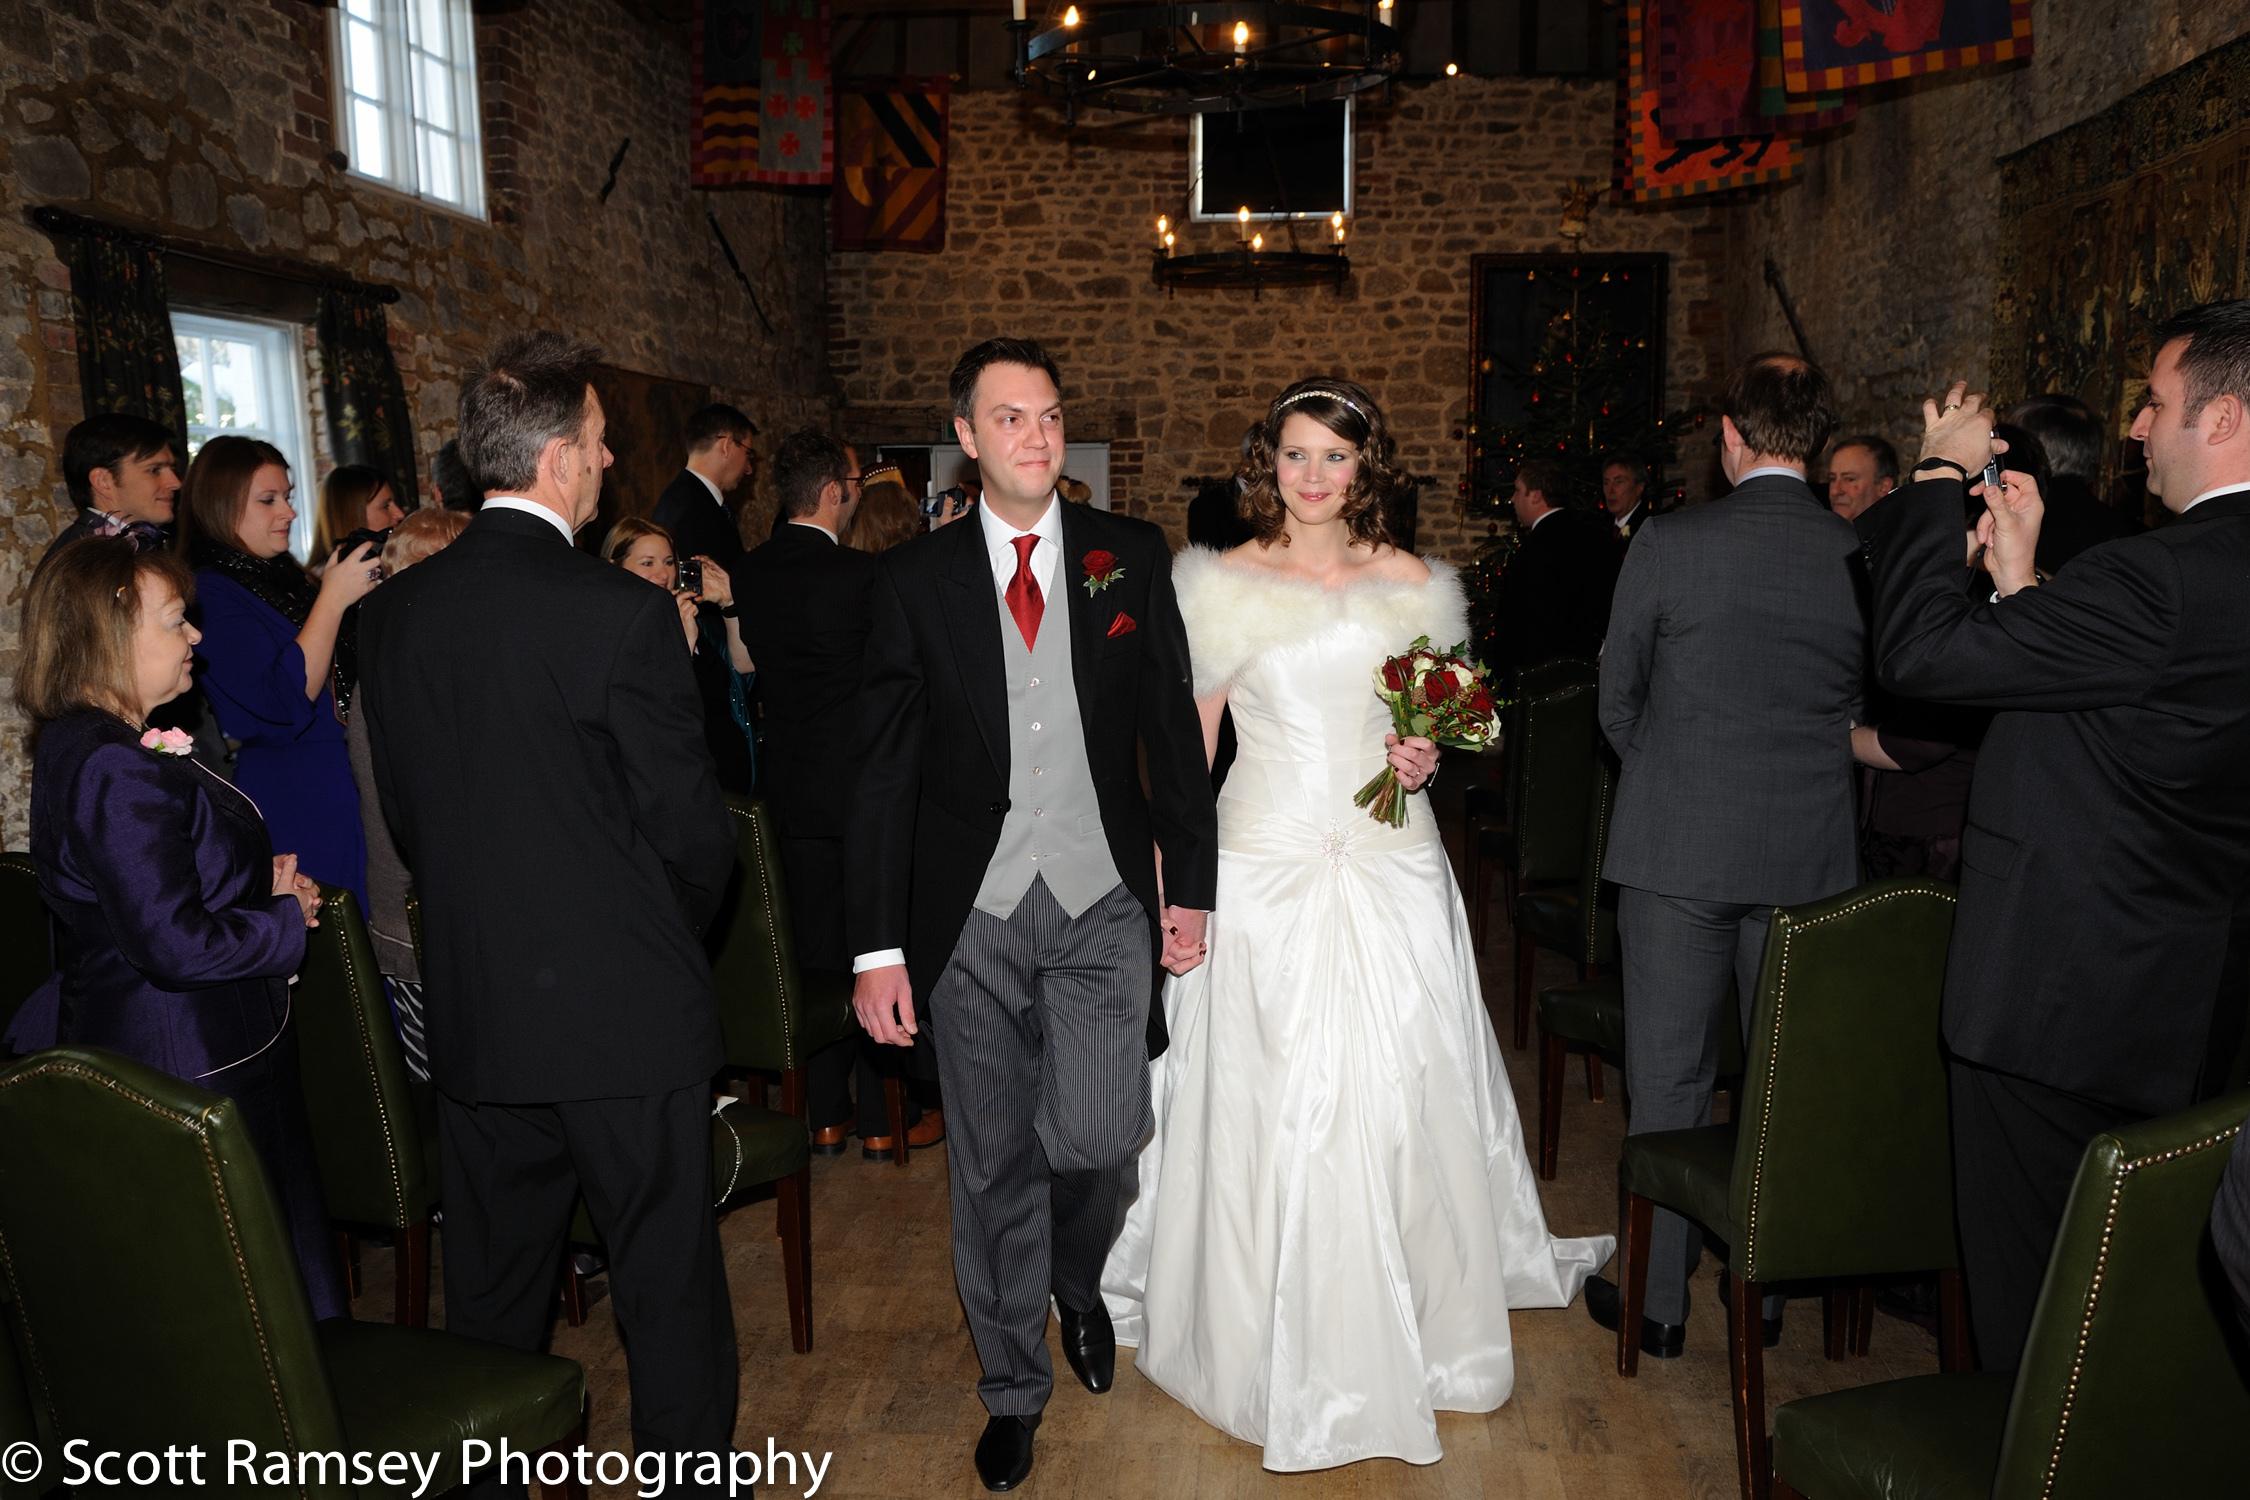 Winter-Wedding-Spread-Eagle-Hotel-Midhurst-Bride-Groom-Walk-Down